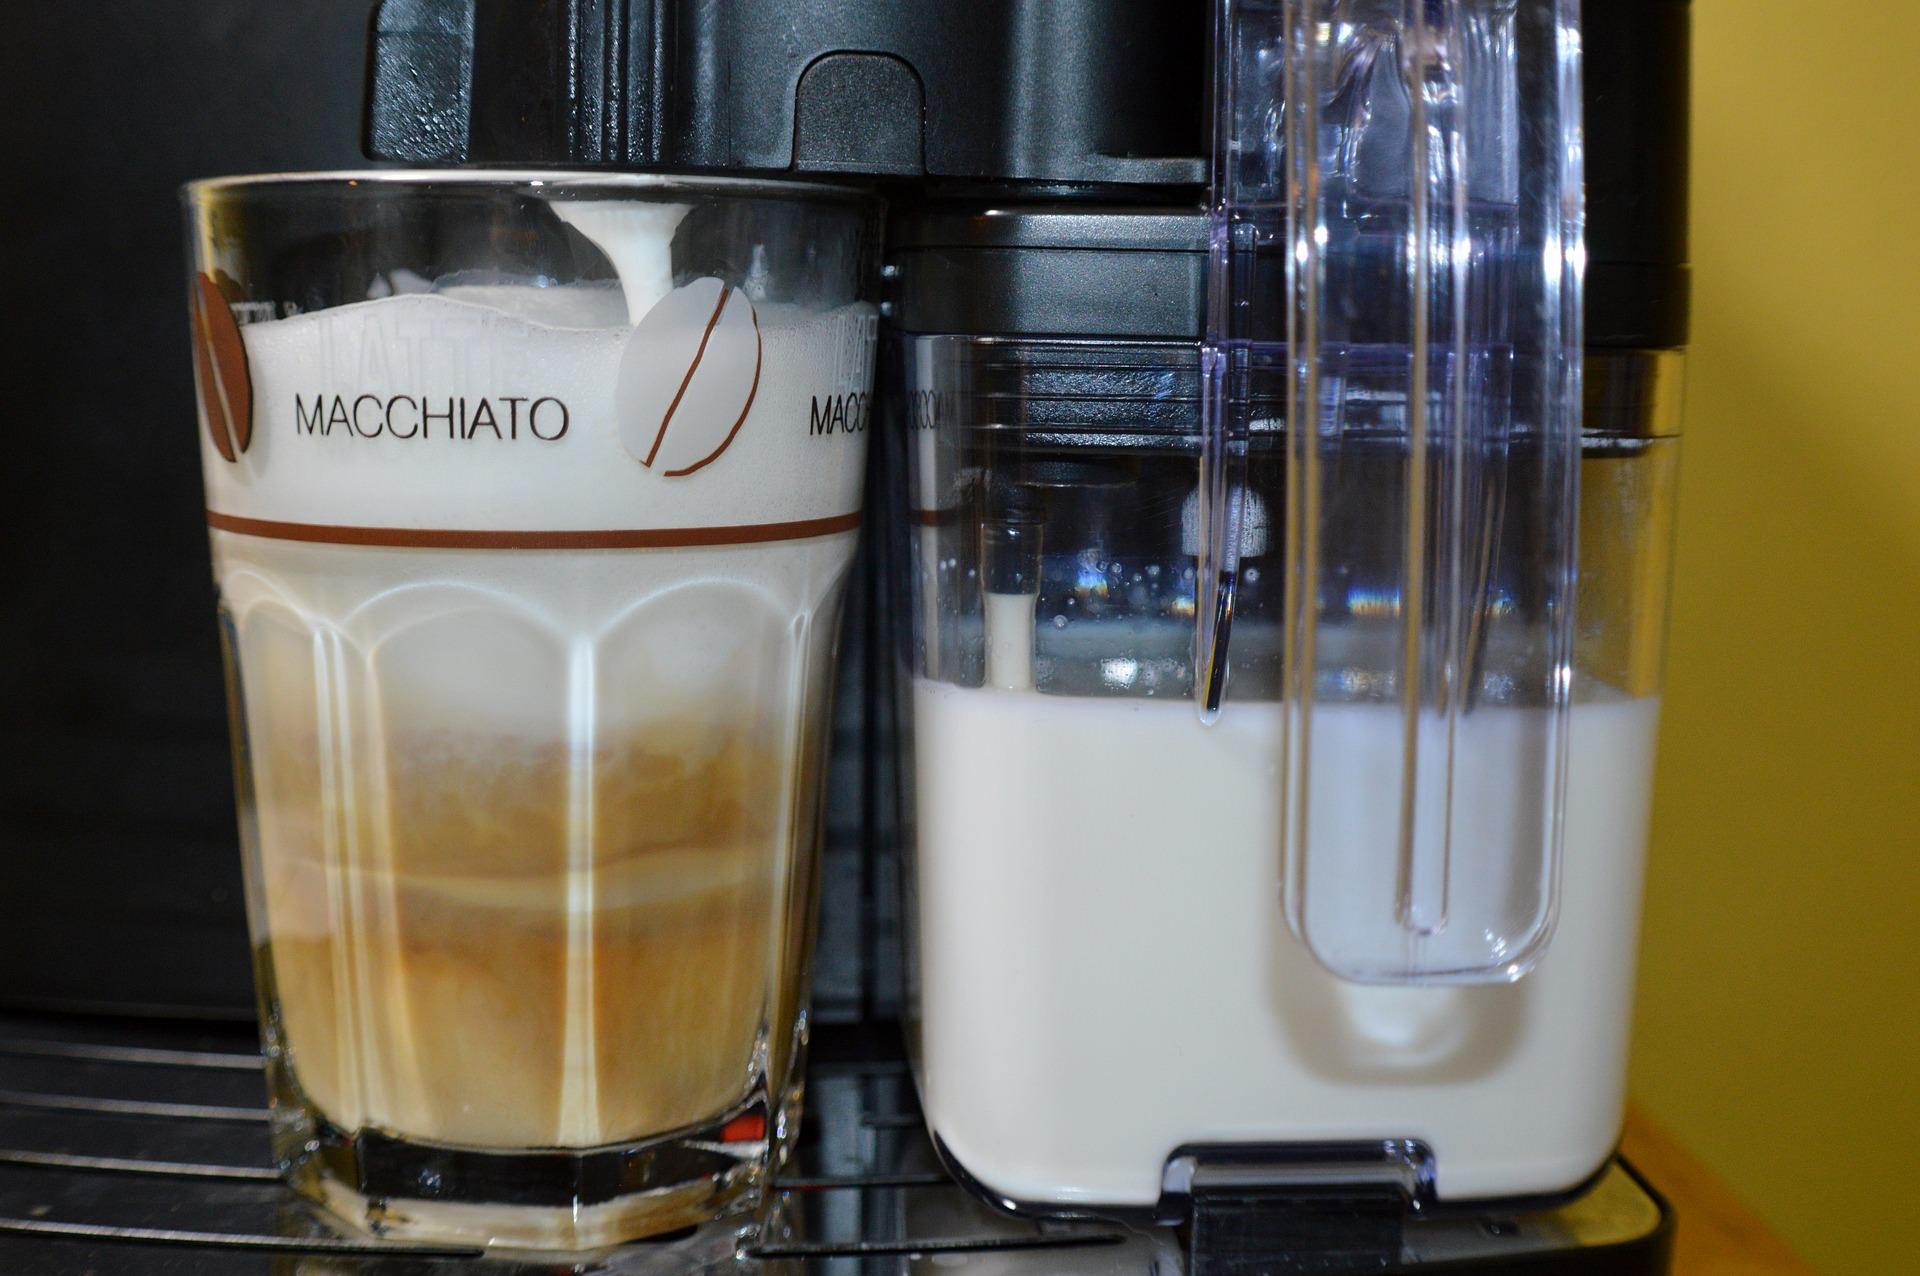 Kaffeevollautomat mit latte macchiato funktion test